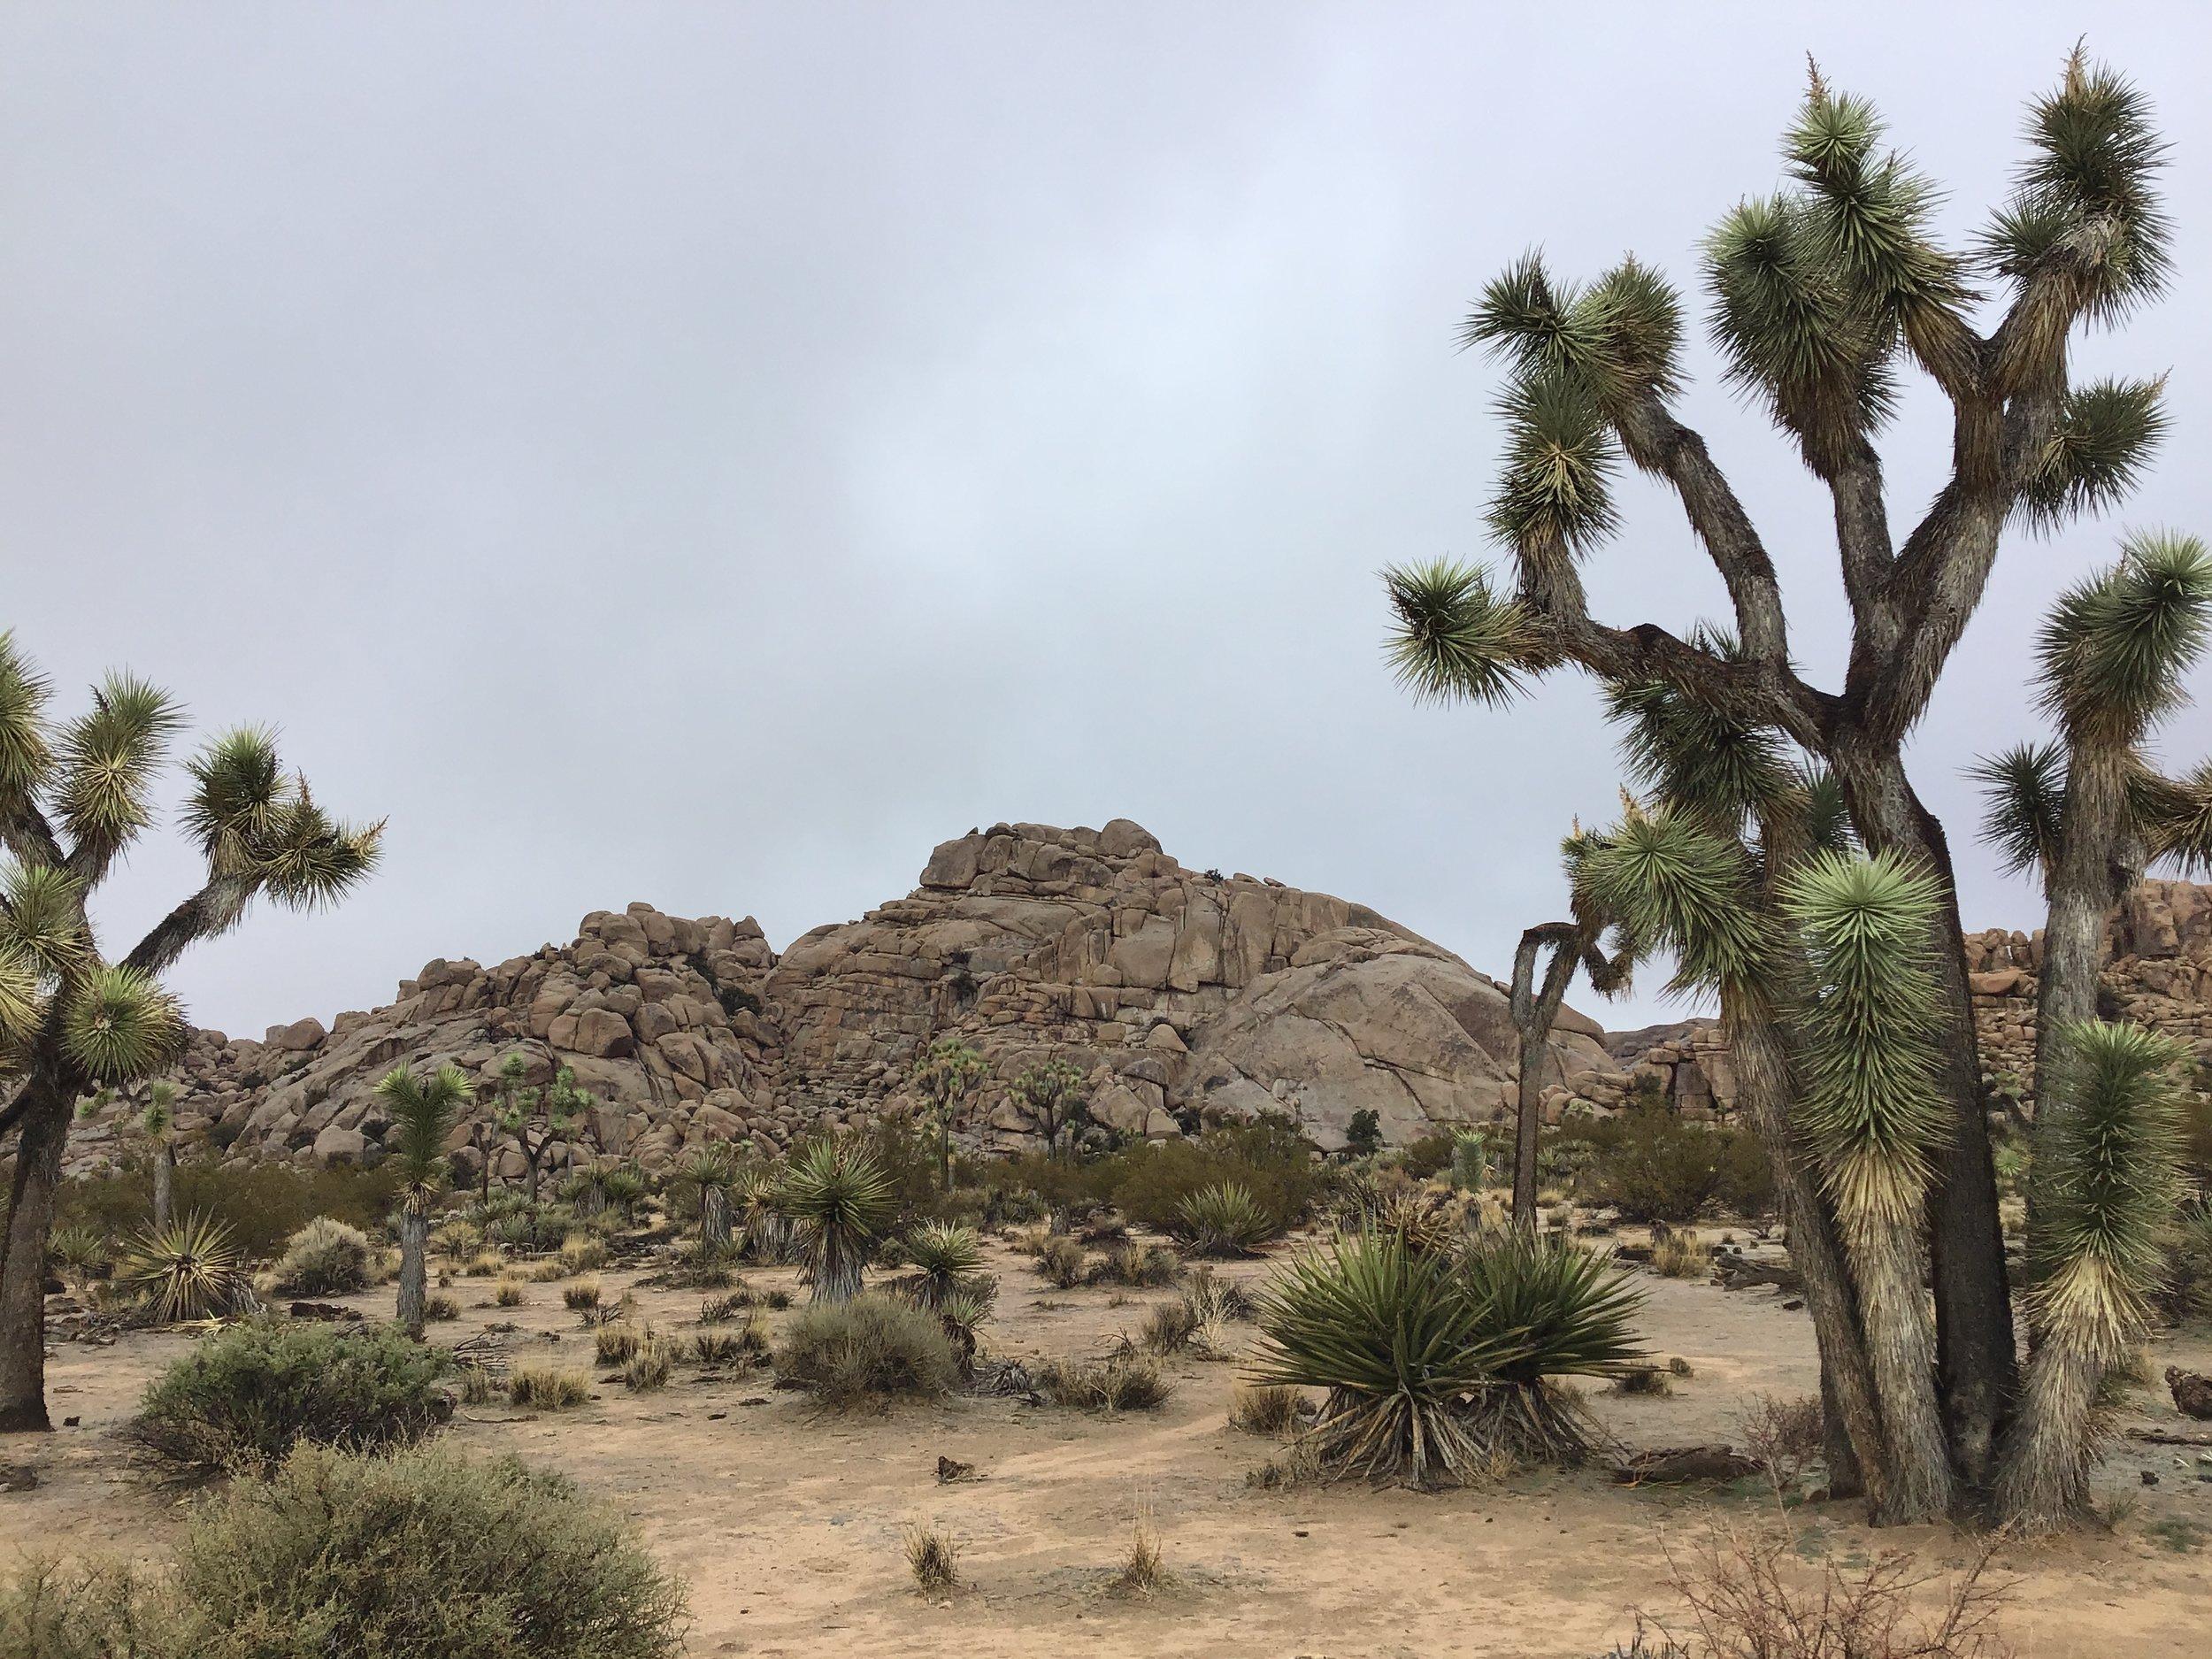 Joshua Tree National Park - Californian desert.